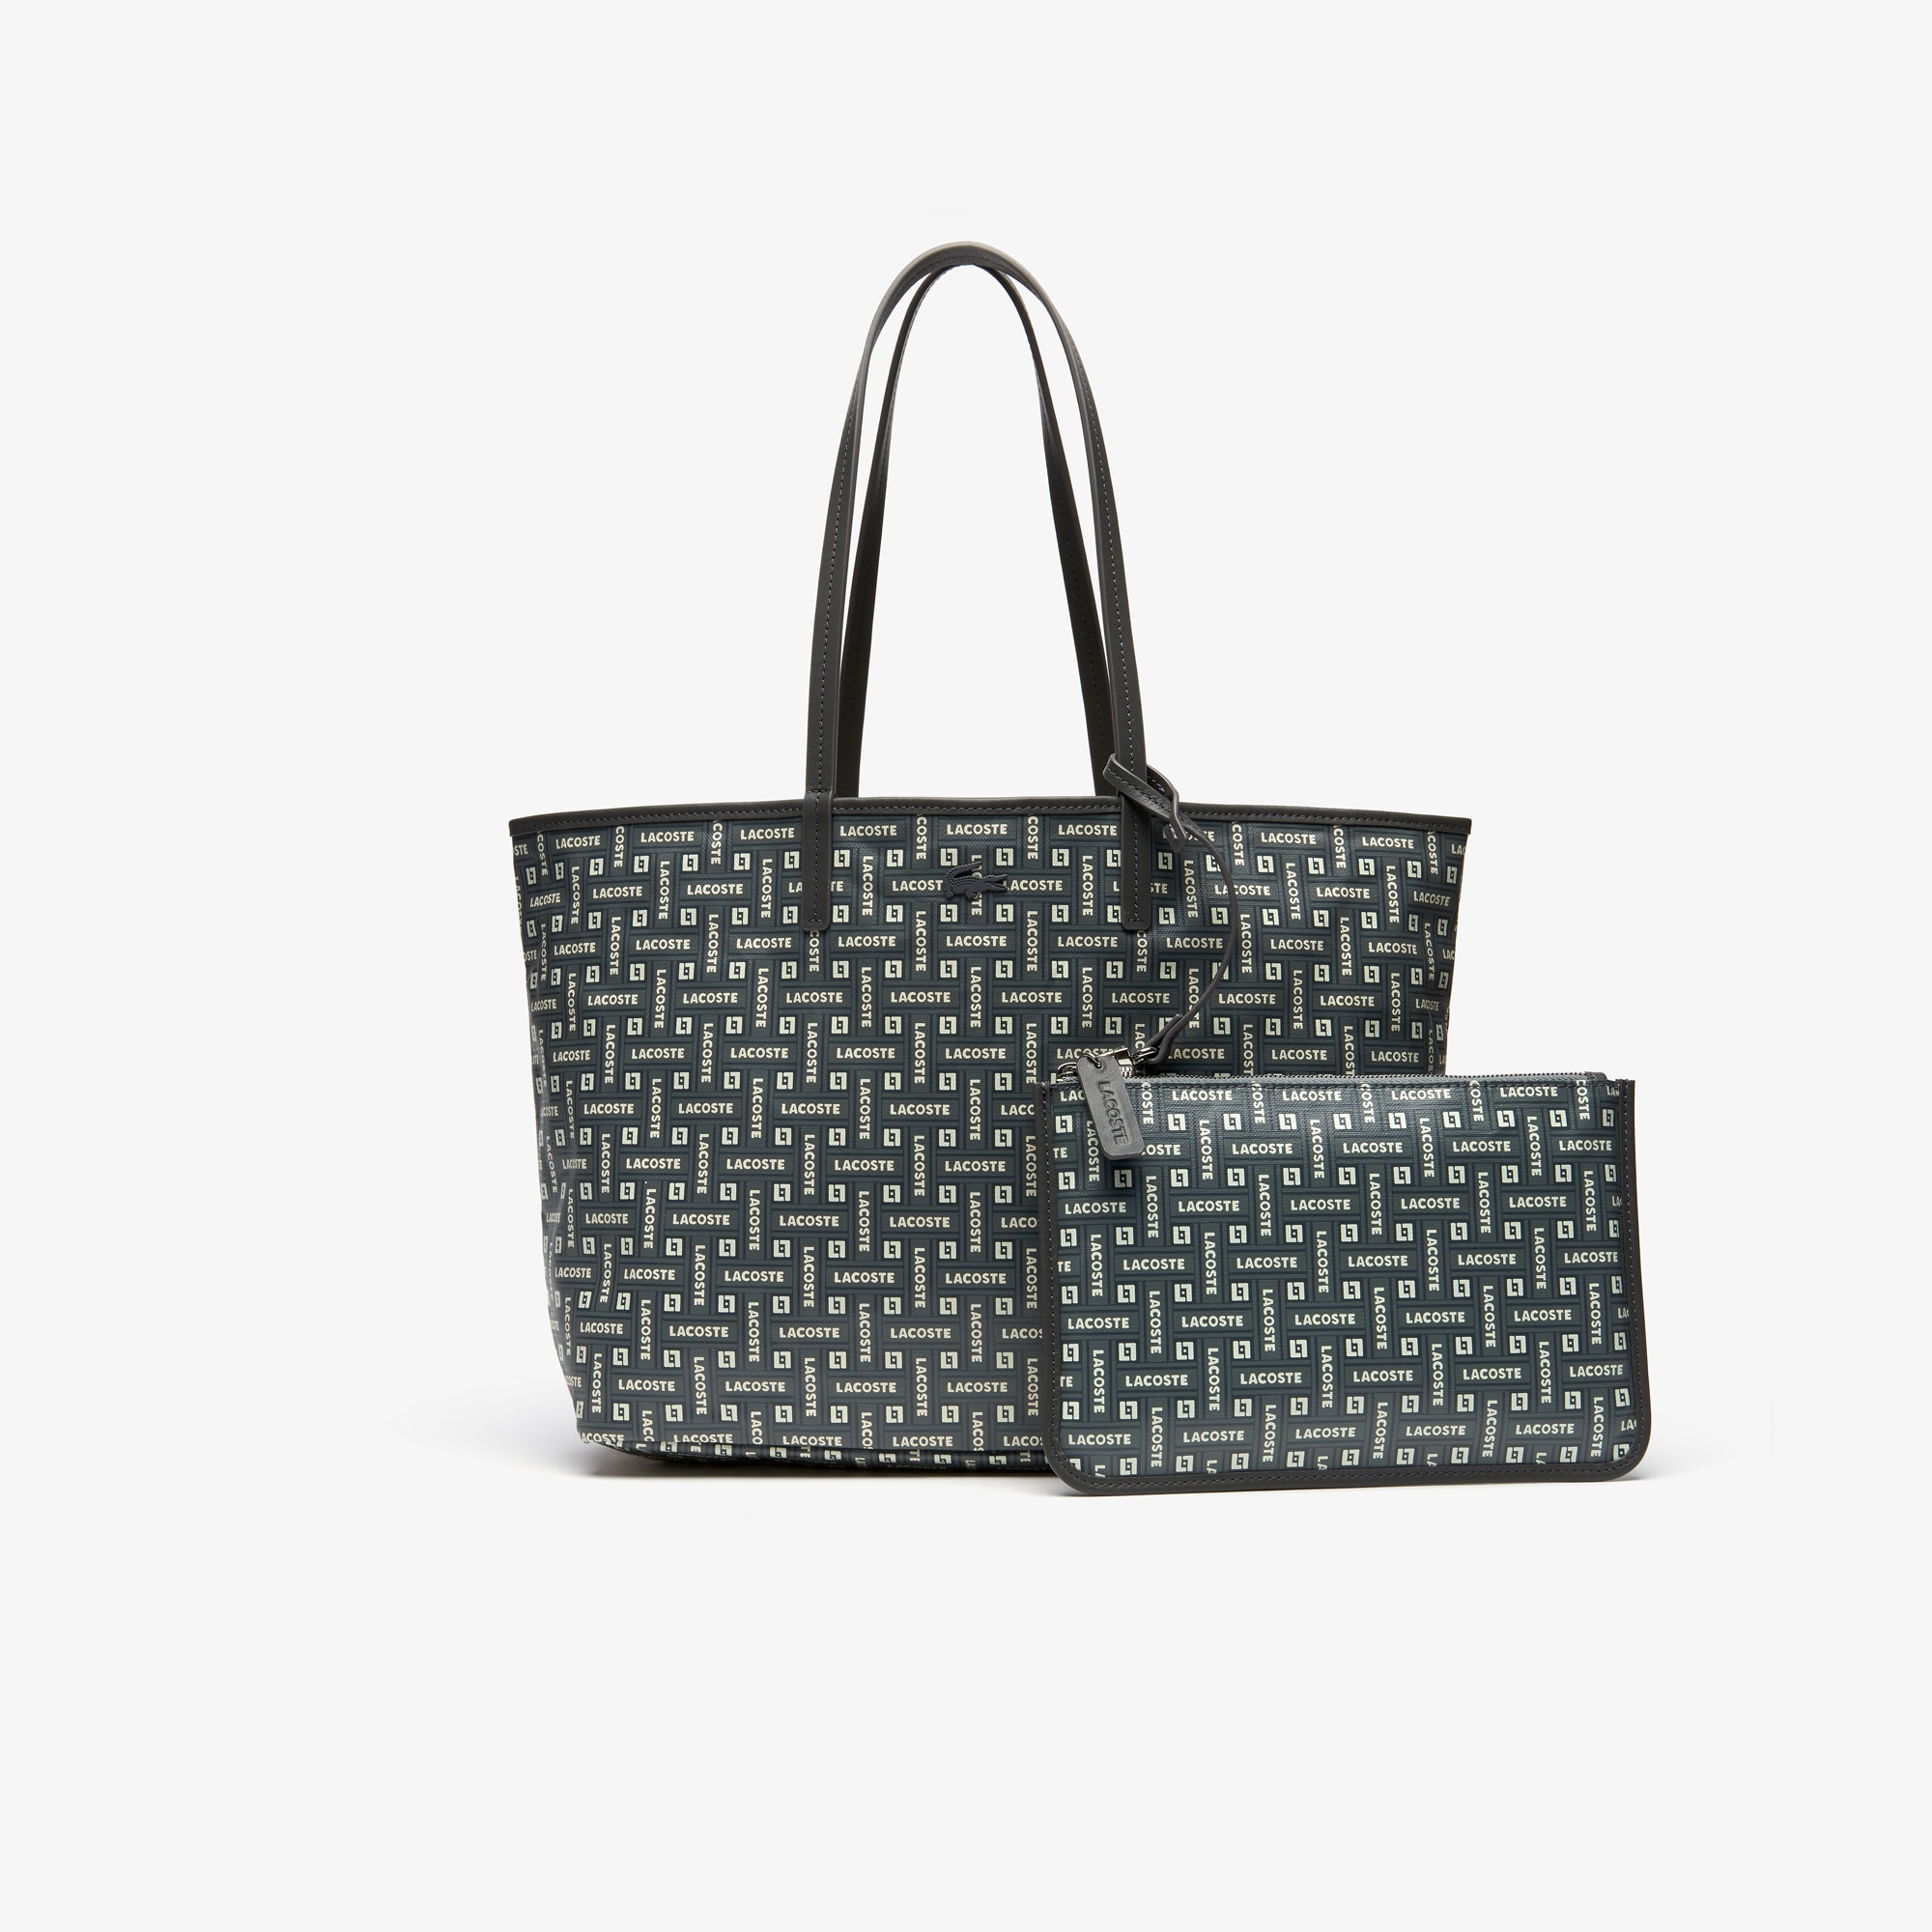 b9d2458f6d Leather Goods for Women: Bags, Wallets & Belts | LACOSTE